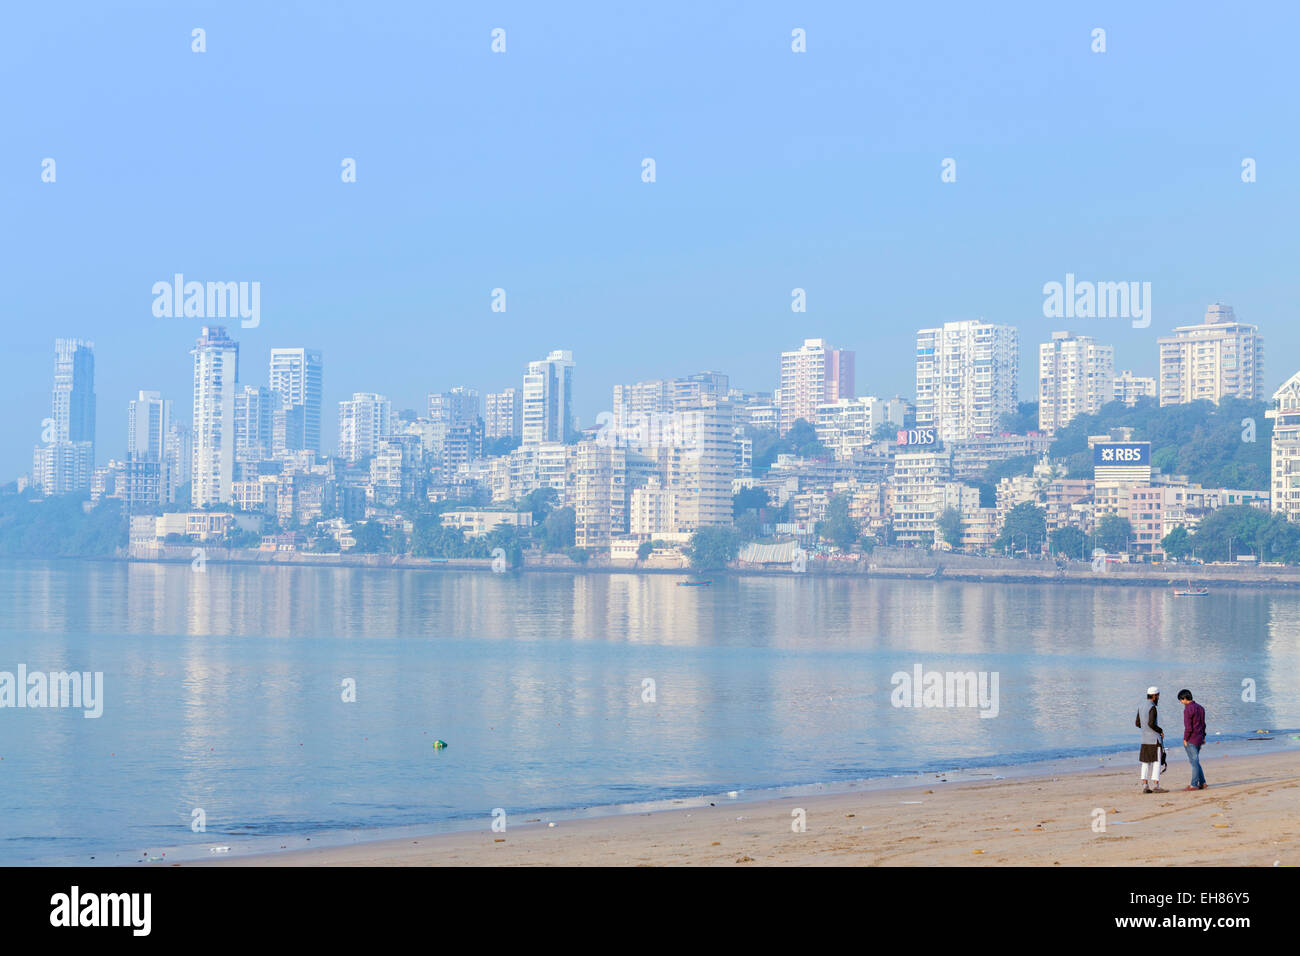 Un musulman et un Hindou man talking on Chowpatty beach, Mumbai, Maharashtra, Inde, Asie Photo Stock